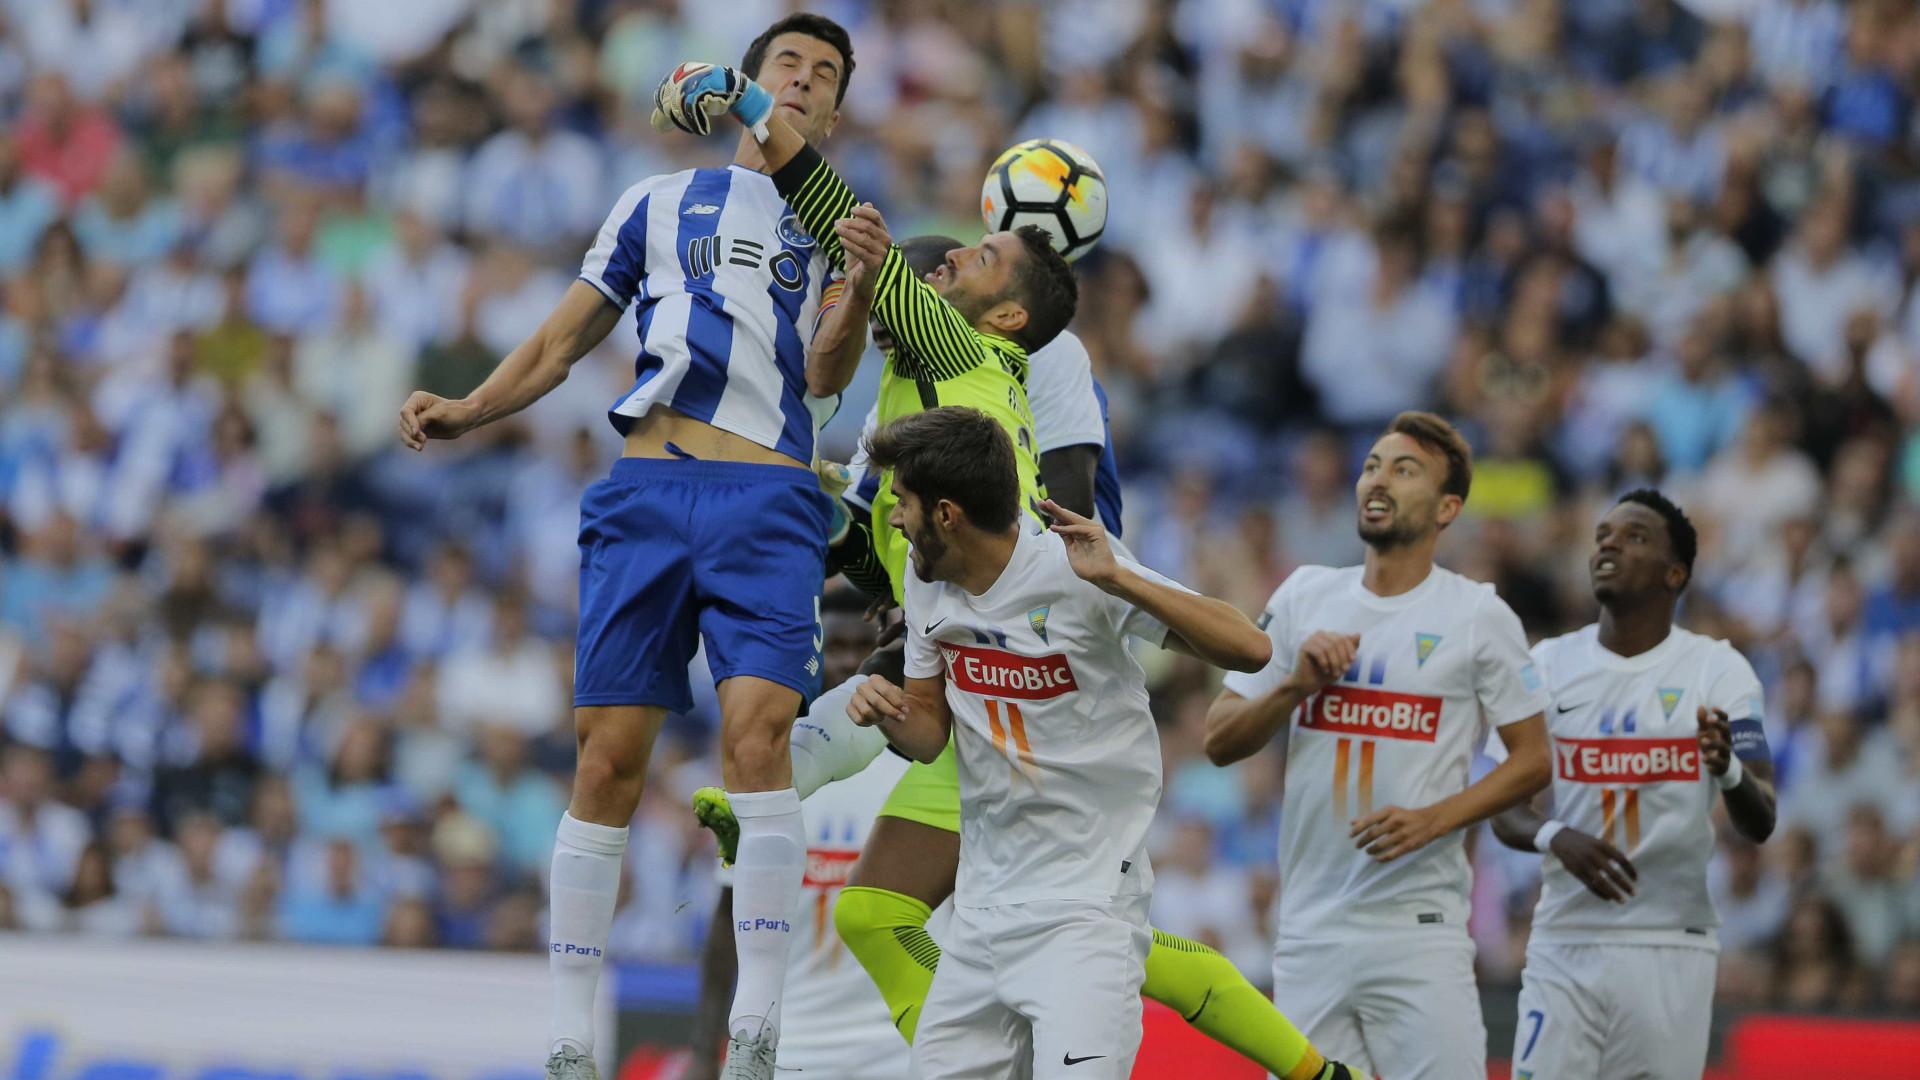 Abatimento na bancada adia segunda parte do Estoril-FC Porto